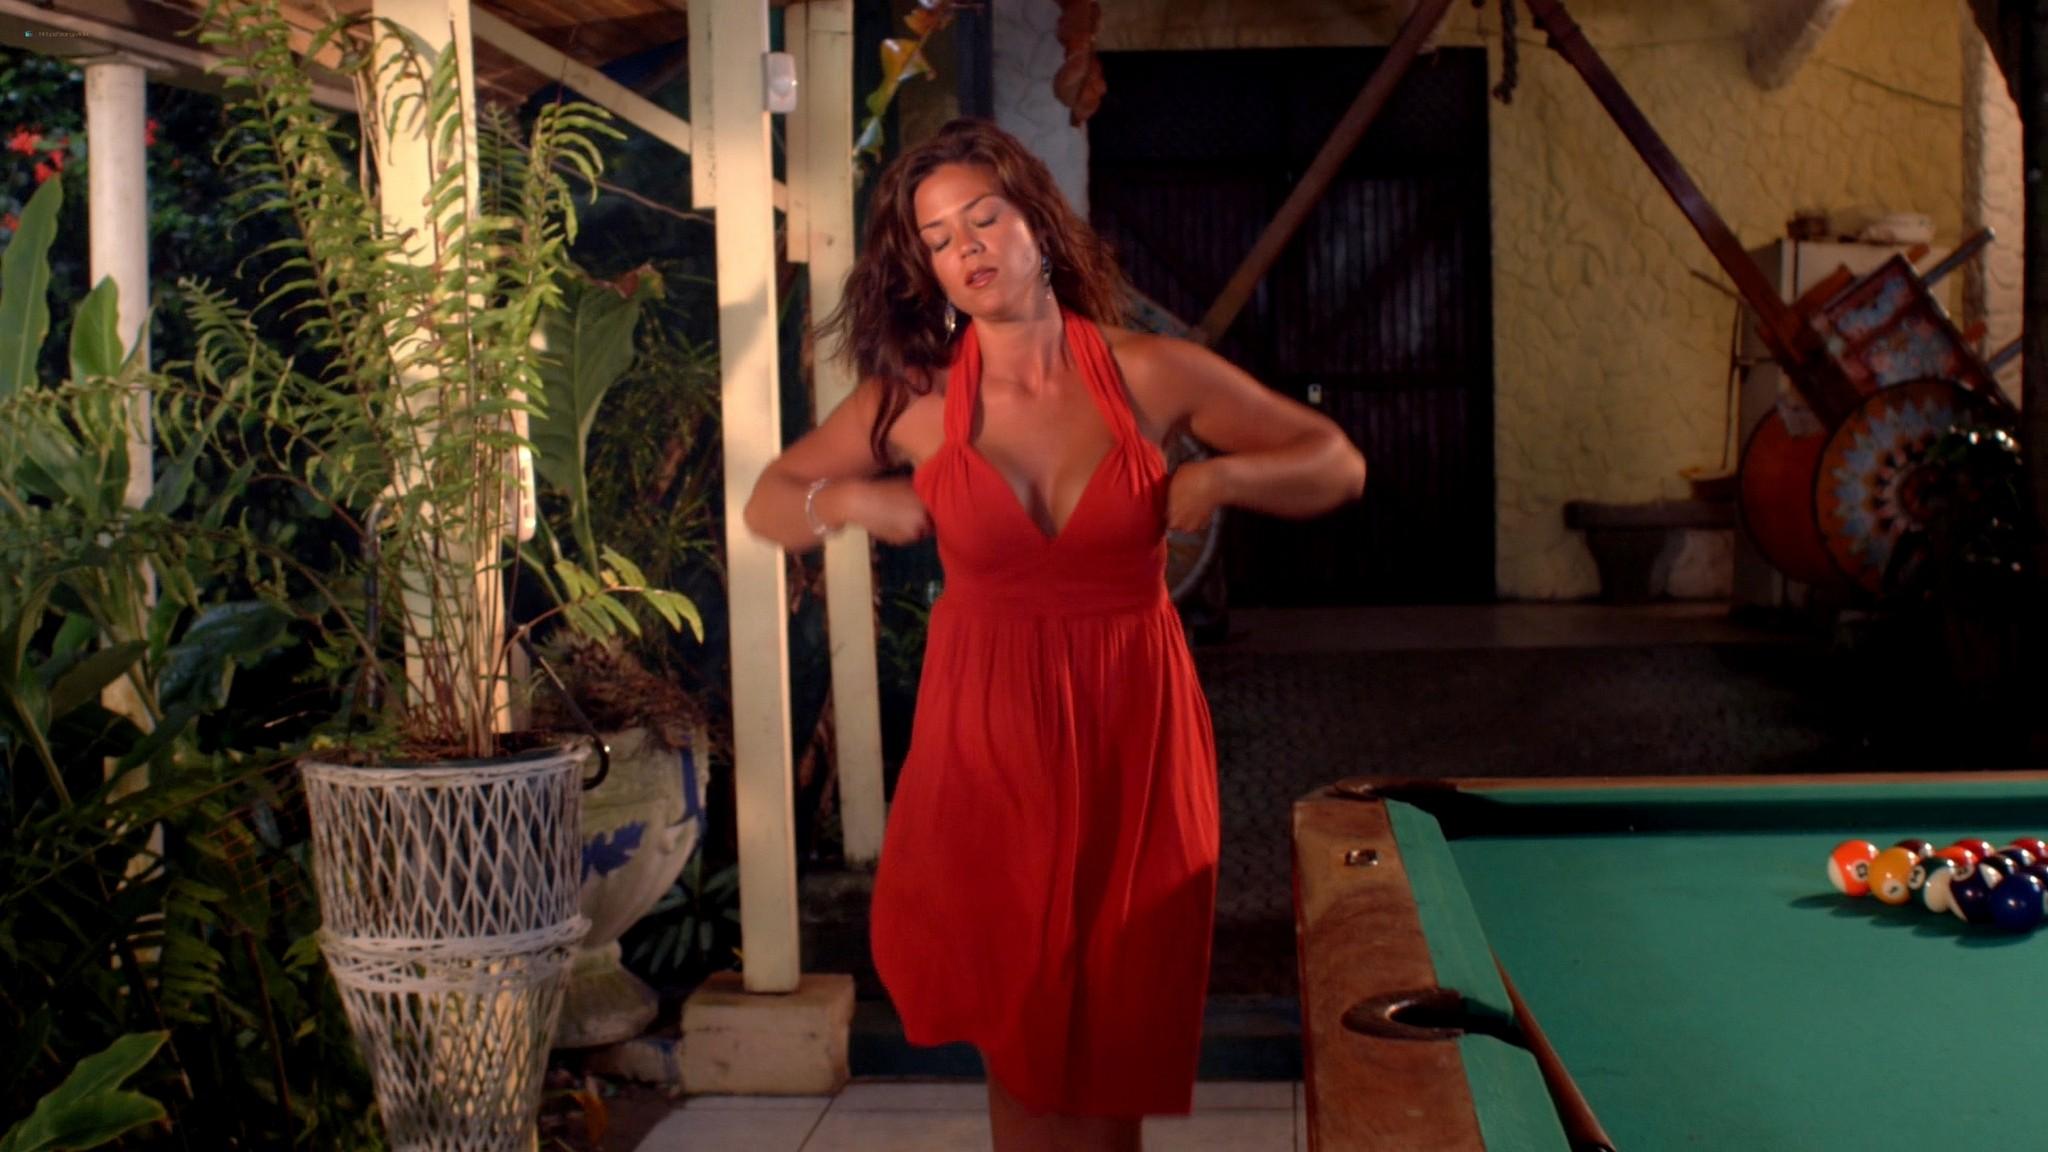 Dana Kollar and Sheila Platte nude topless Julianna Guill and Susan Ward hot Costa Rican Summer 2009 1080p Web 7